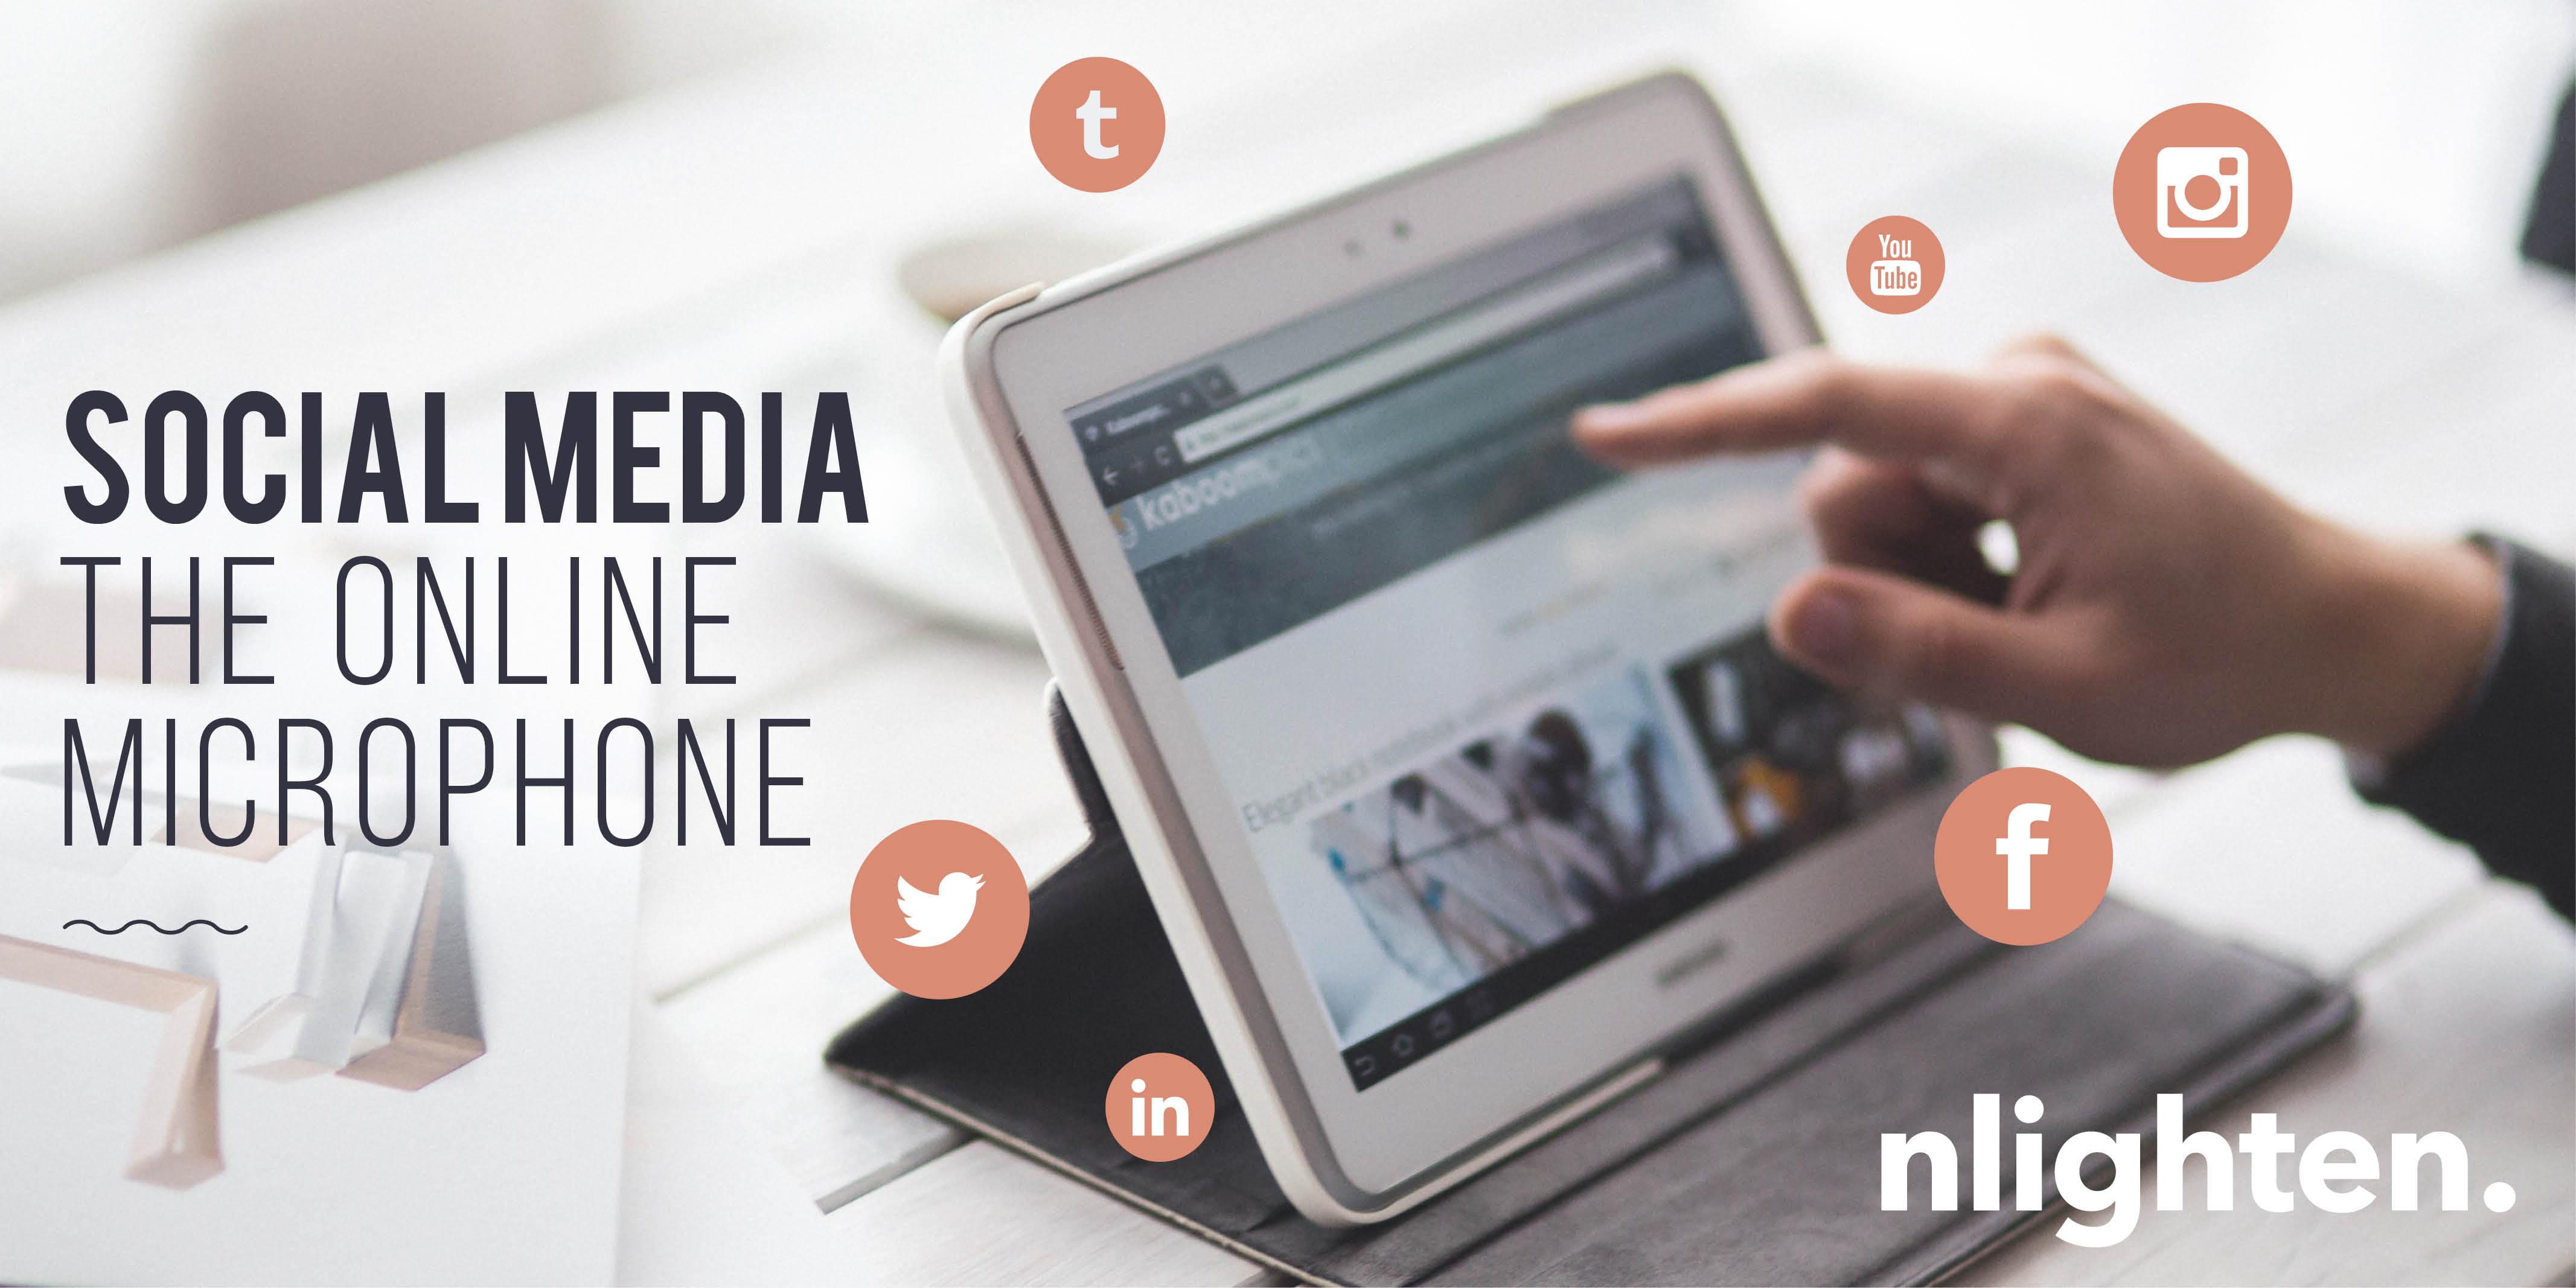 nlighten Blog_Social Media_The Online Microphone! 12 April 2017